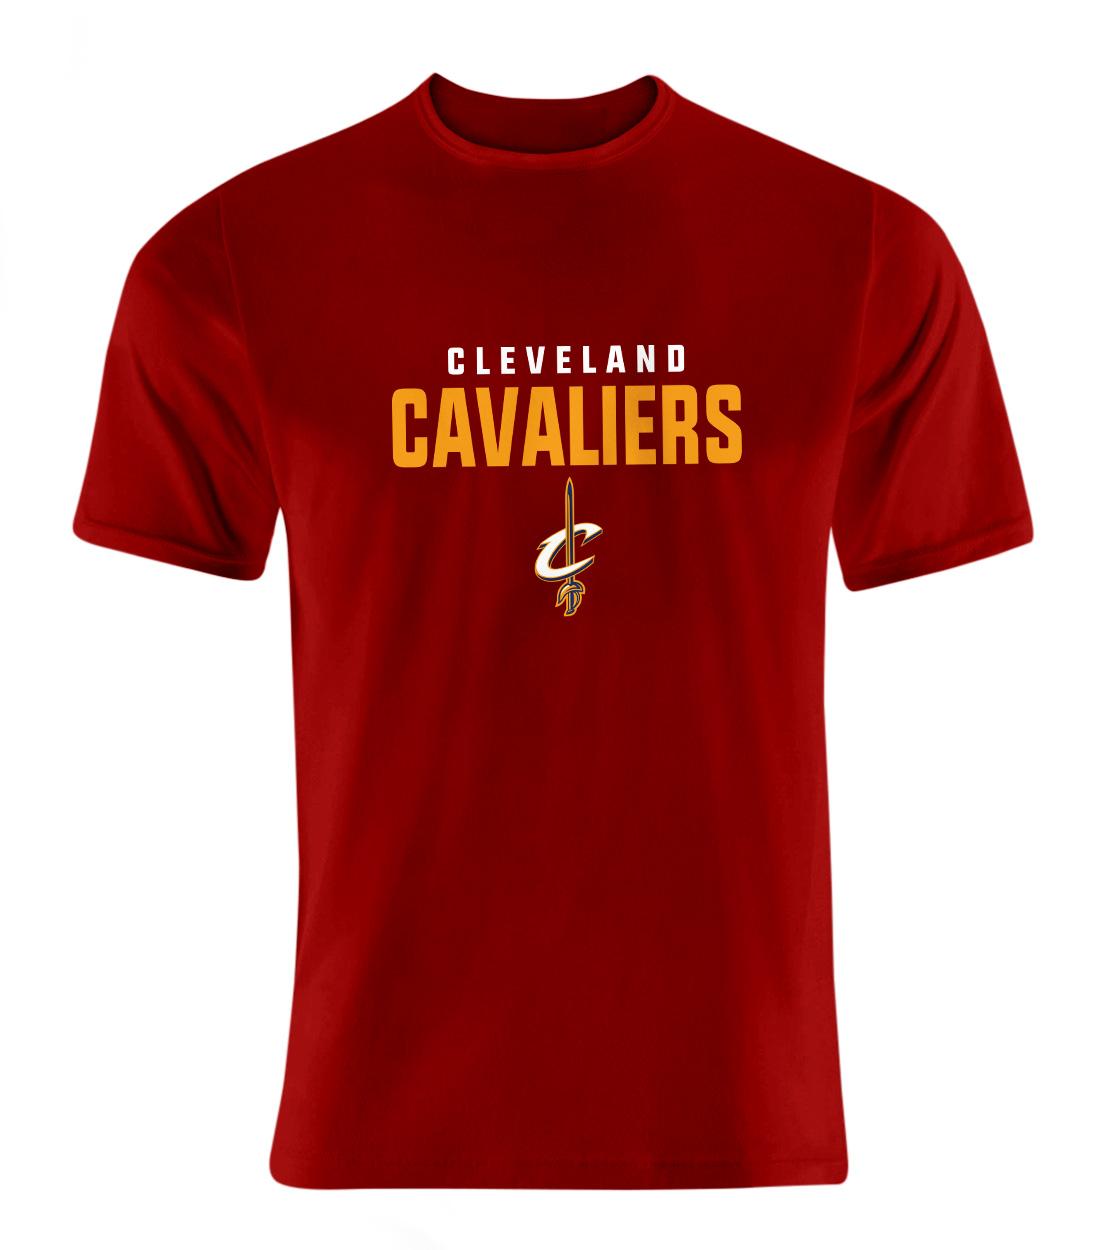 Cleveland Cavaliers Tshirt (TSH-RED-NP-62-NBA-CLE-CAVS.FLAT)